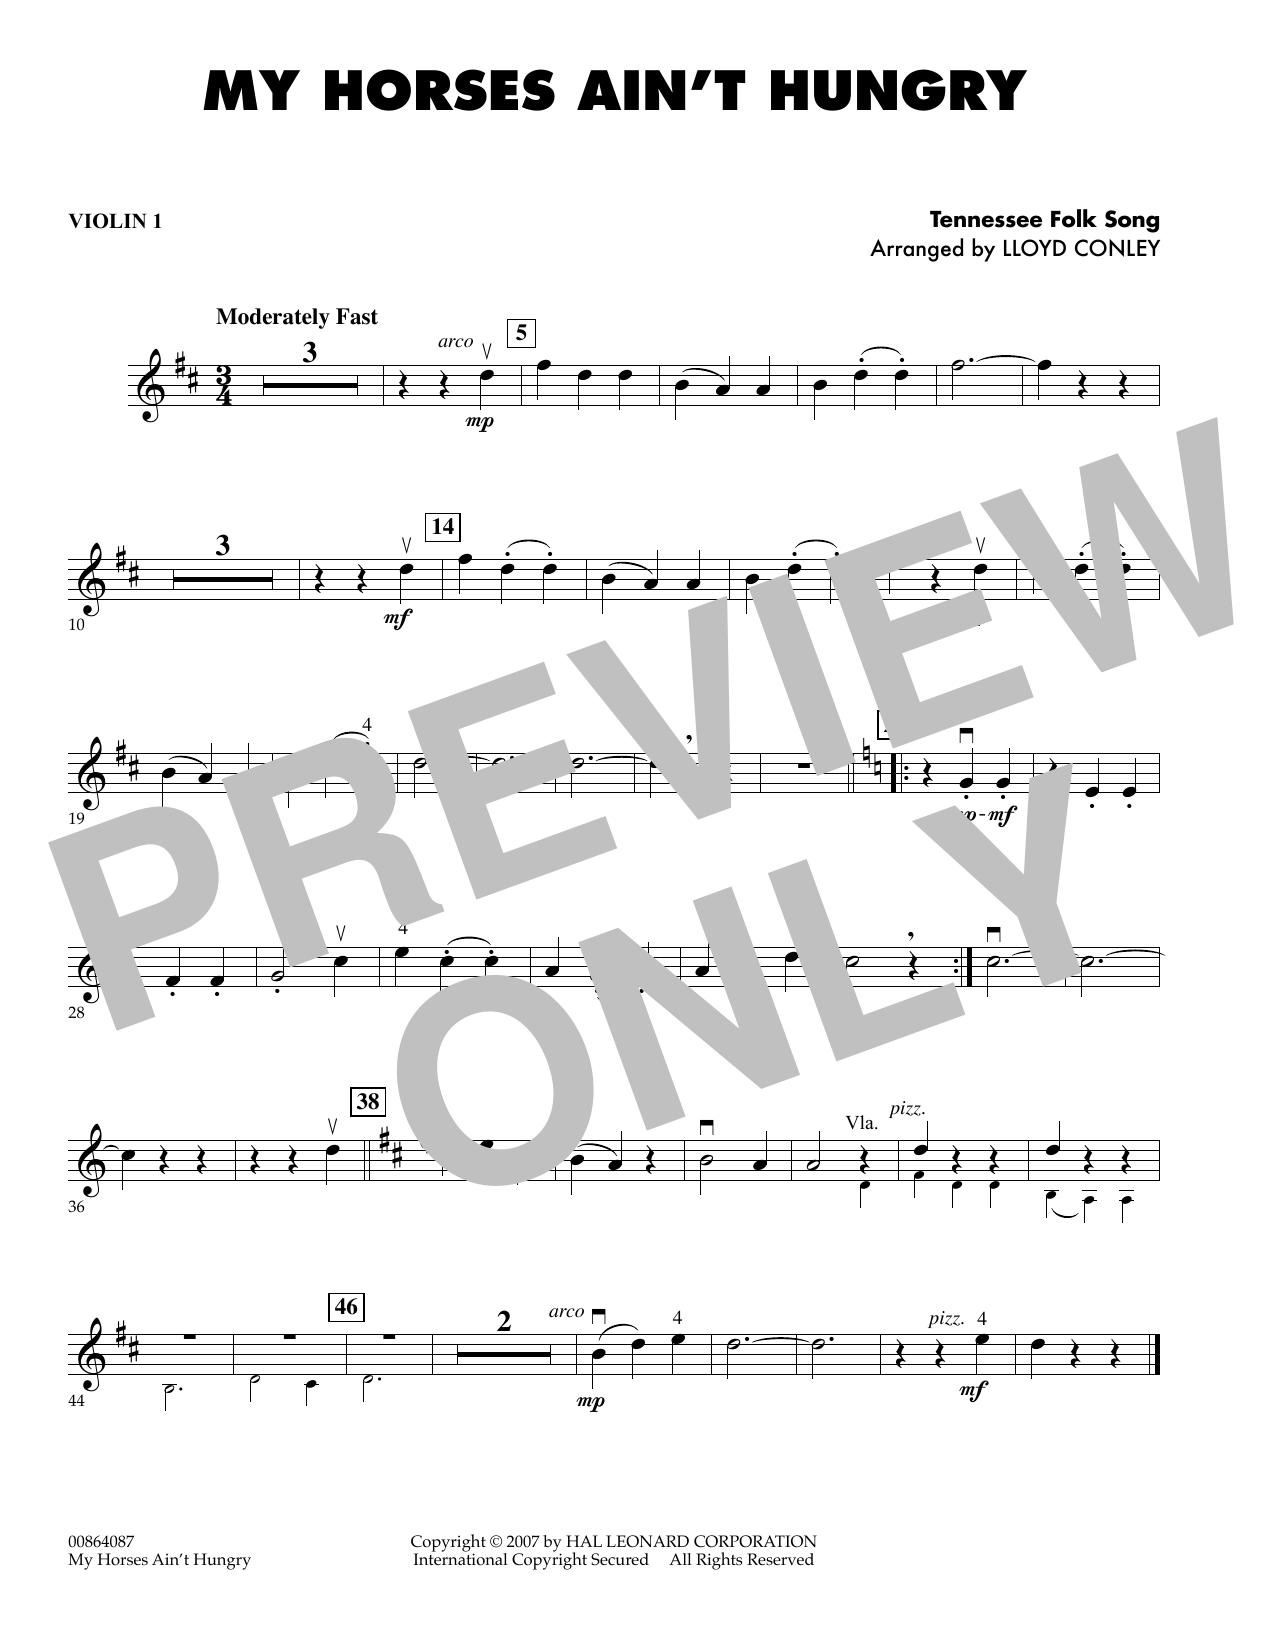 My Horses Ain't Hungry - Violin 1 sheet music